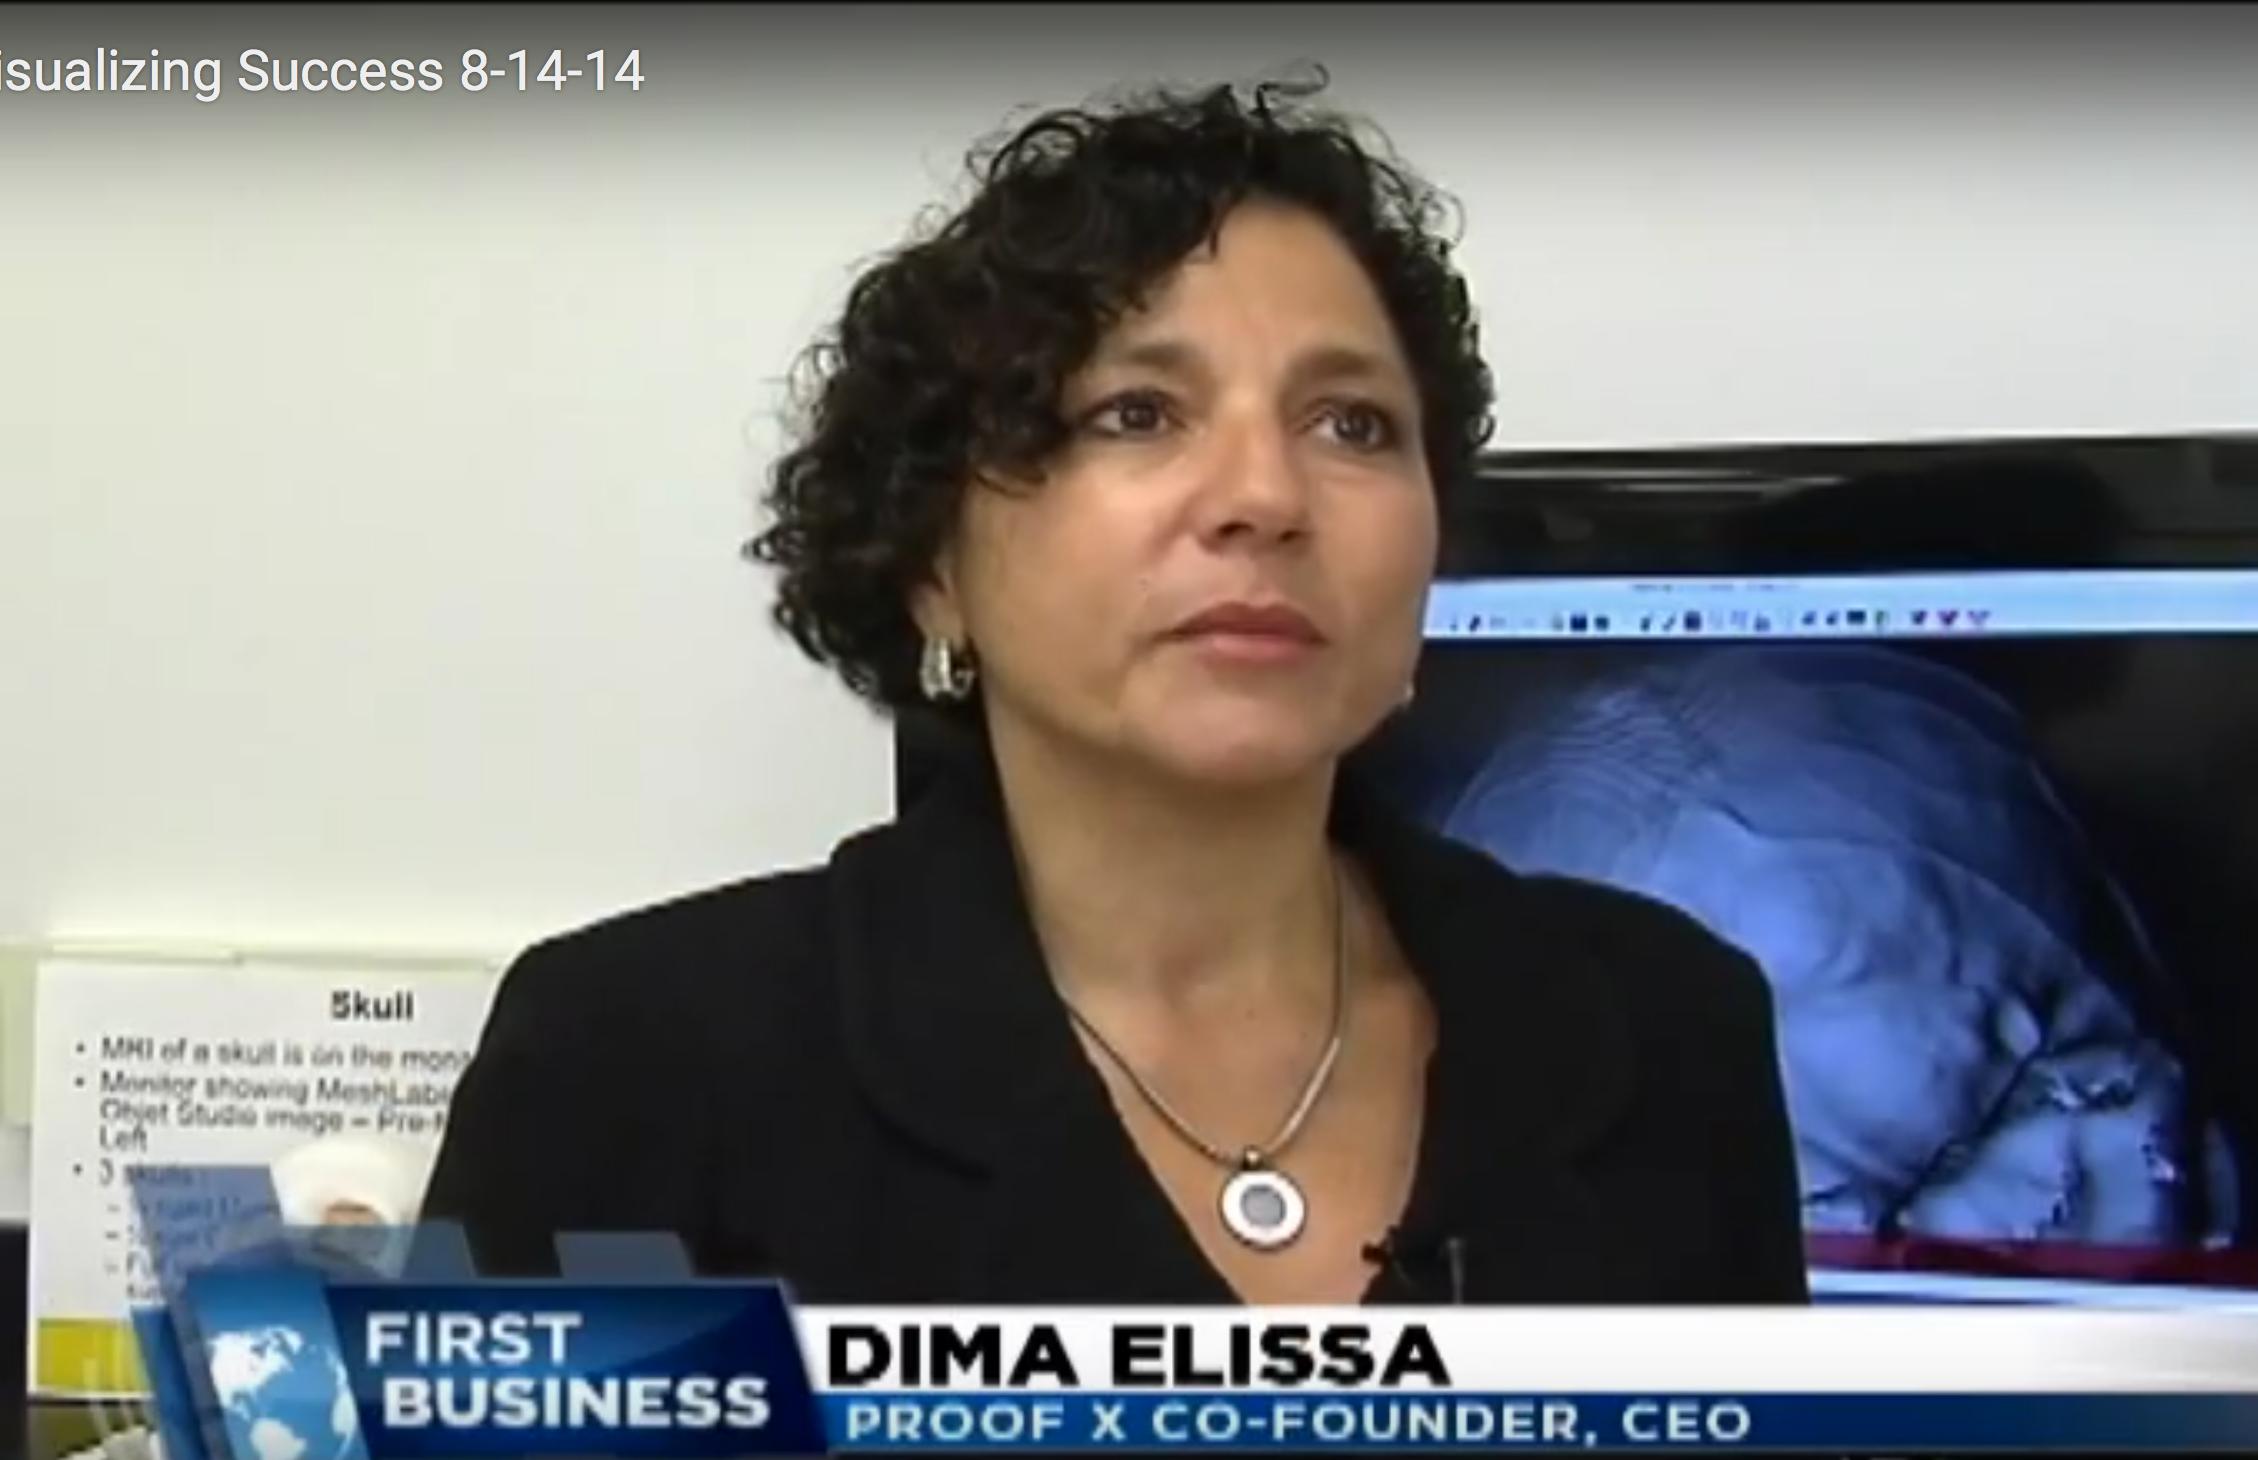 Dima_Elissa-Business_First